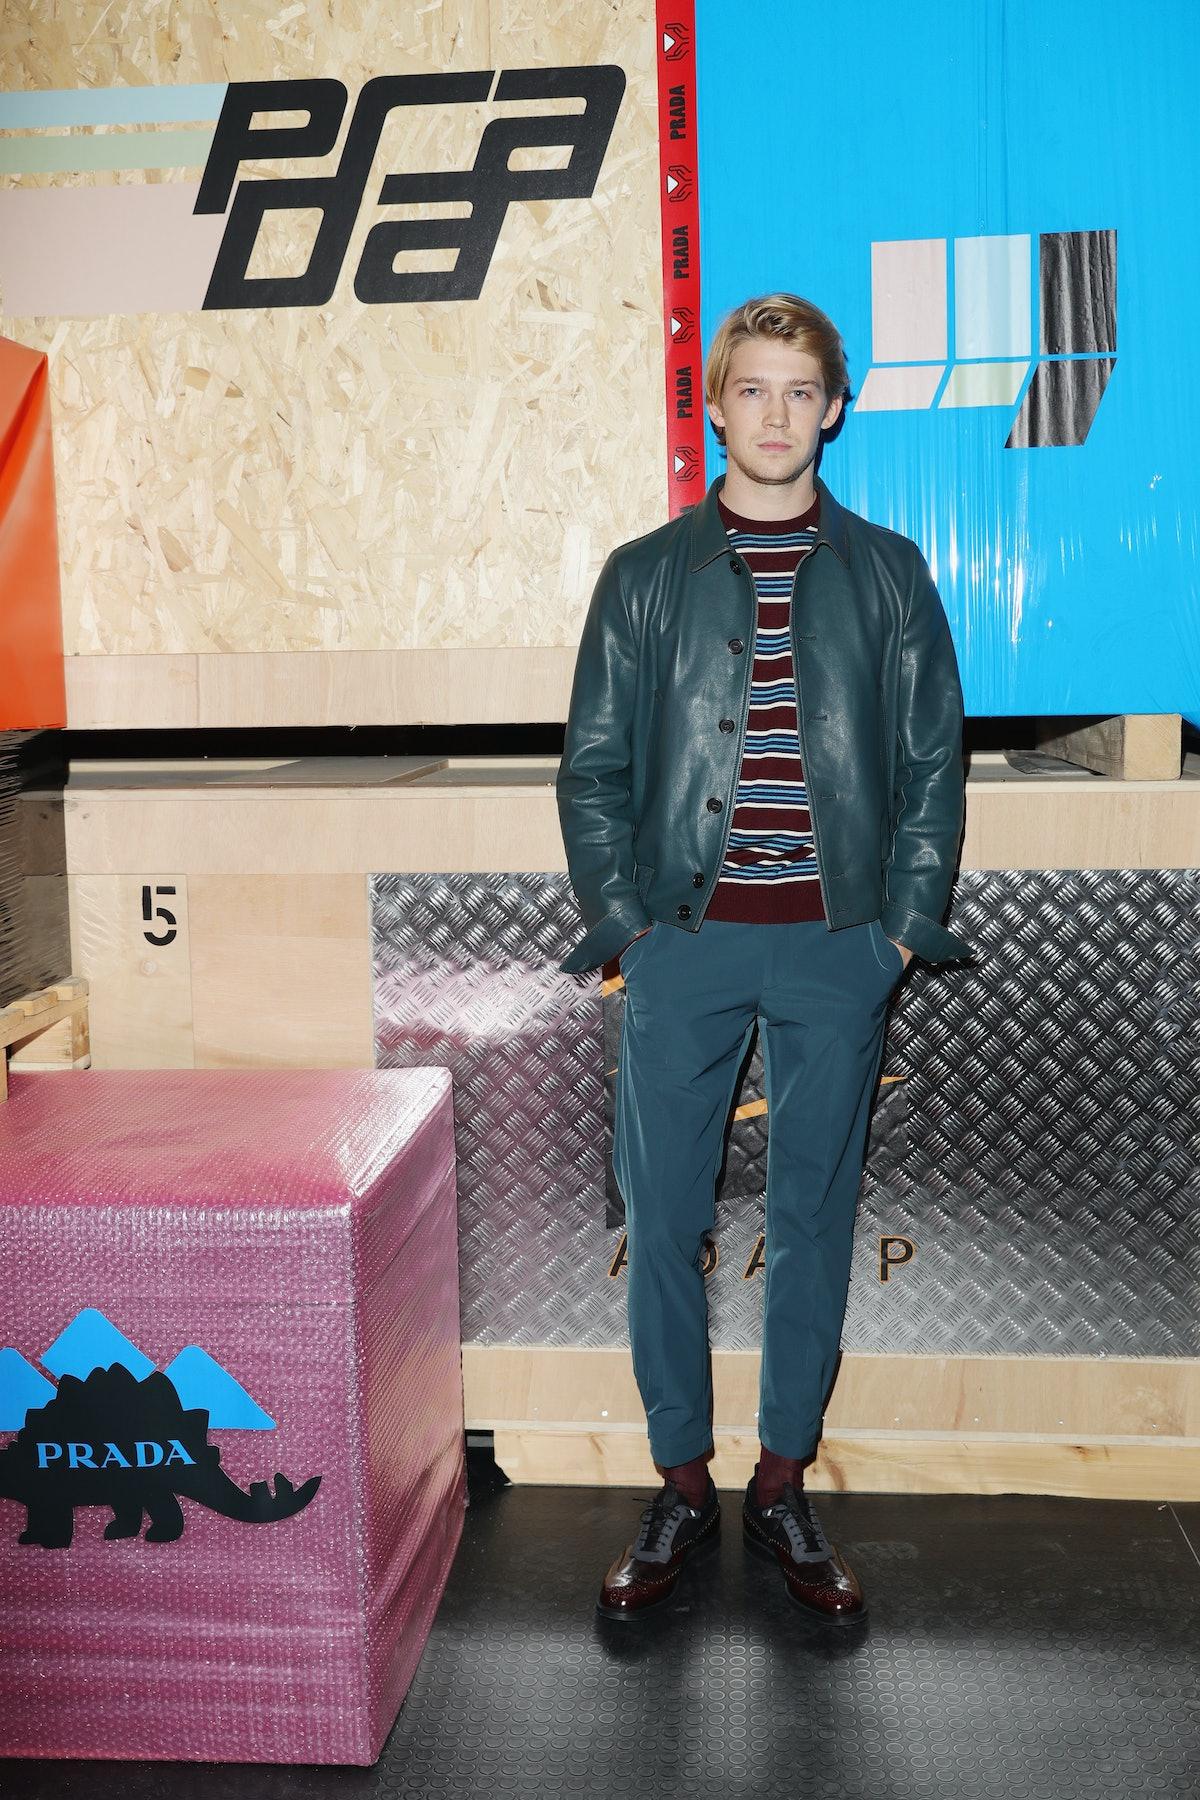 Prada - Arrivals & Front Row - Milan Men's Fashion Week Fall/Winter 2018/19